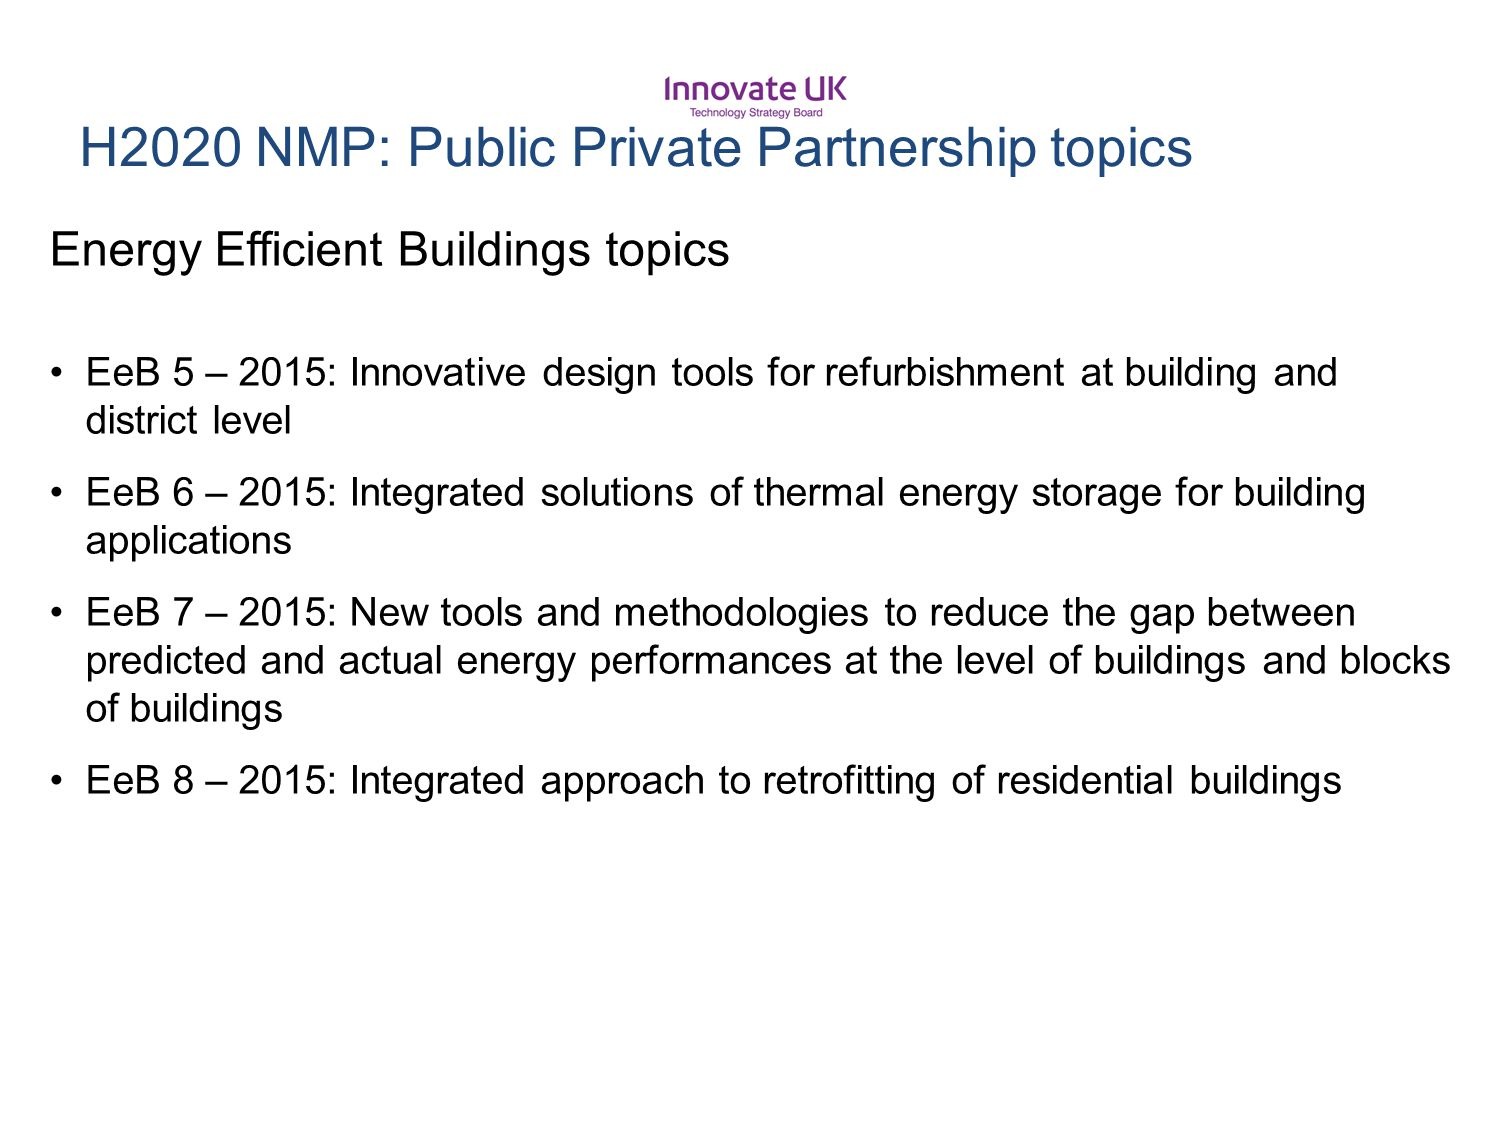 H2020 NMP: Public Private Partnership topics